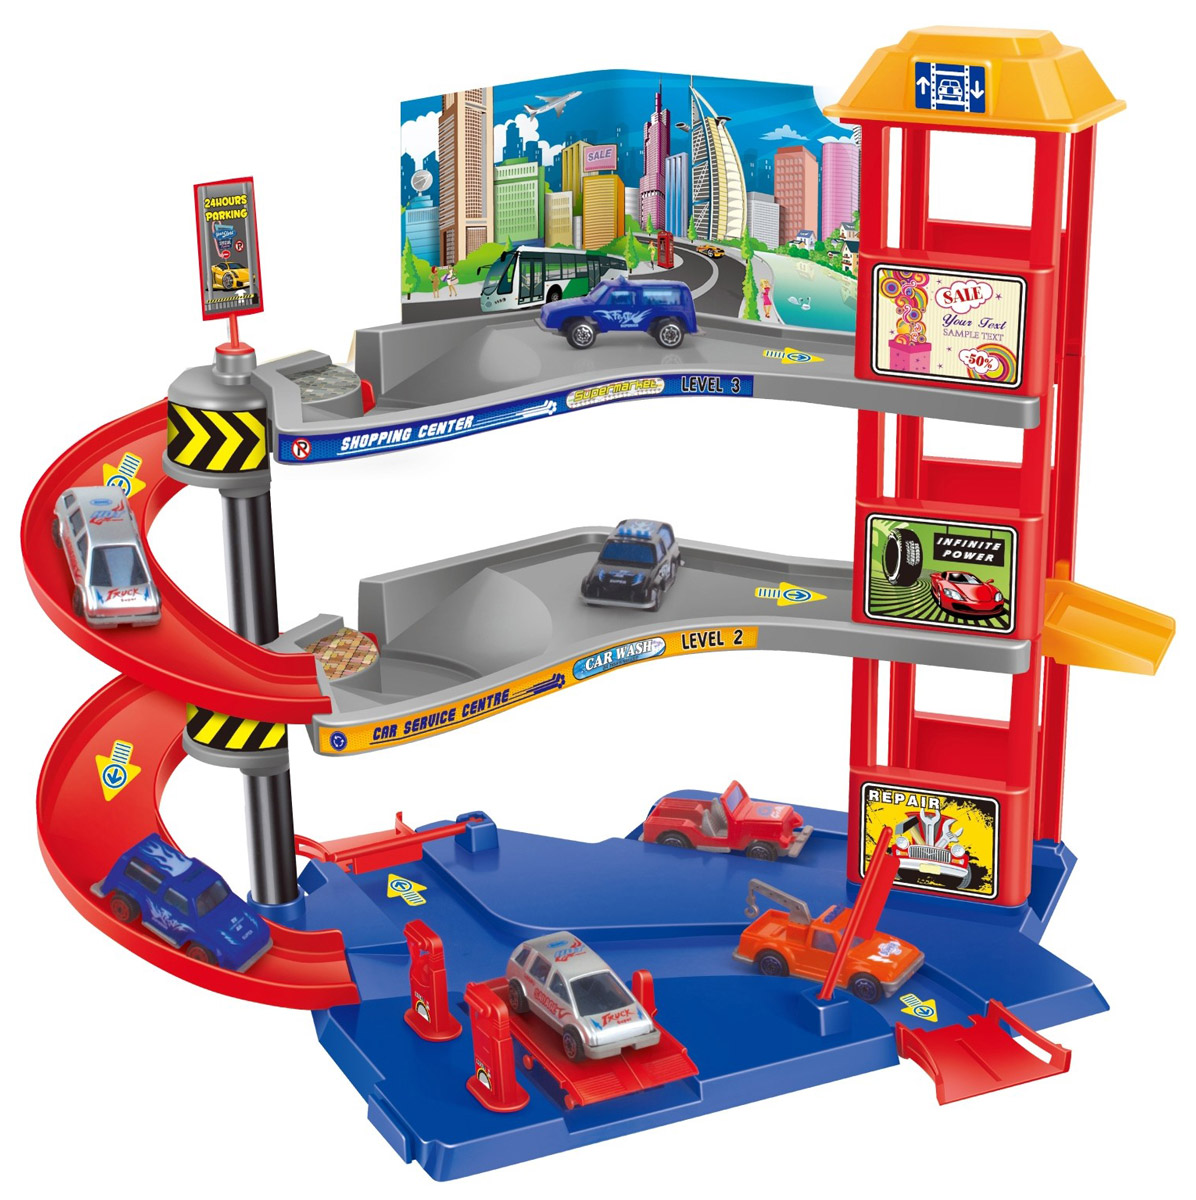 Dave Toy Игровой набор Парковочная башня набор для сборки машинки s2 muscle car deluxe modarri